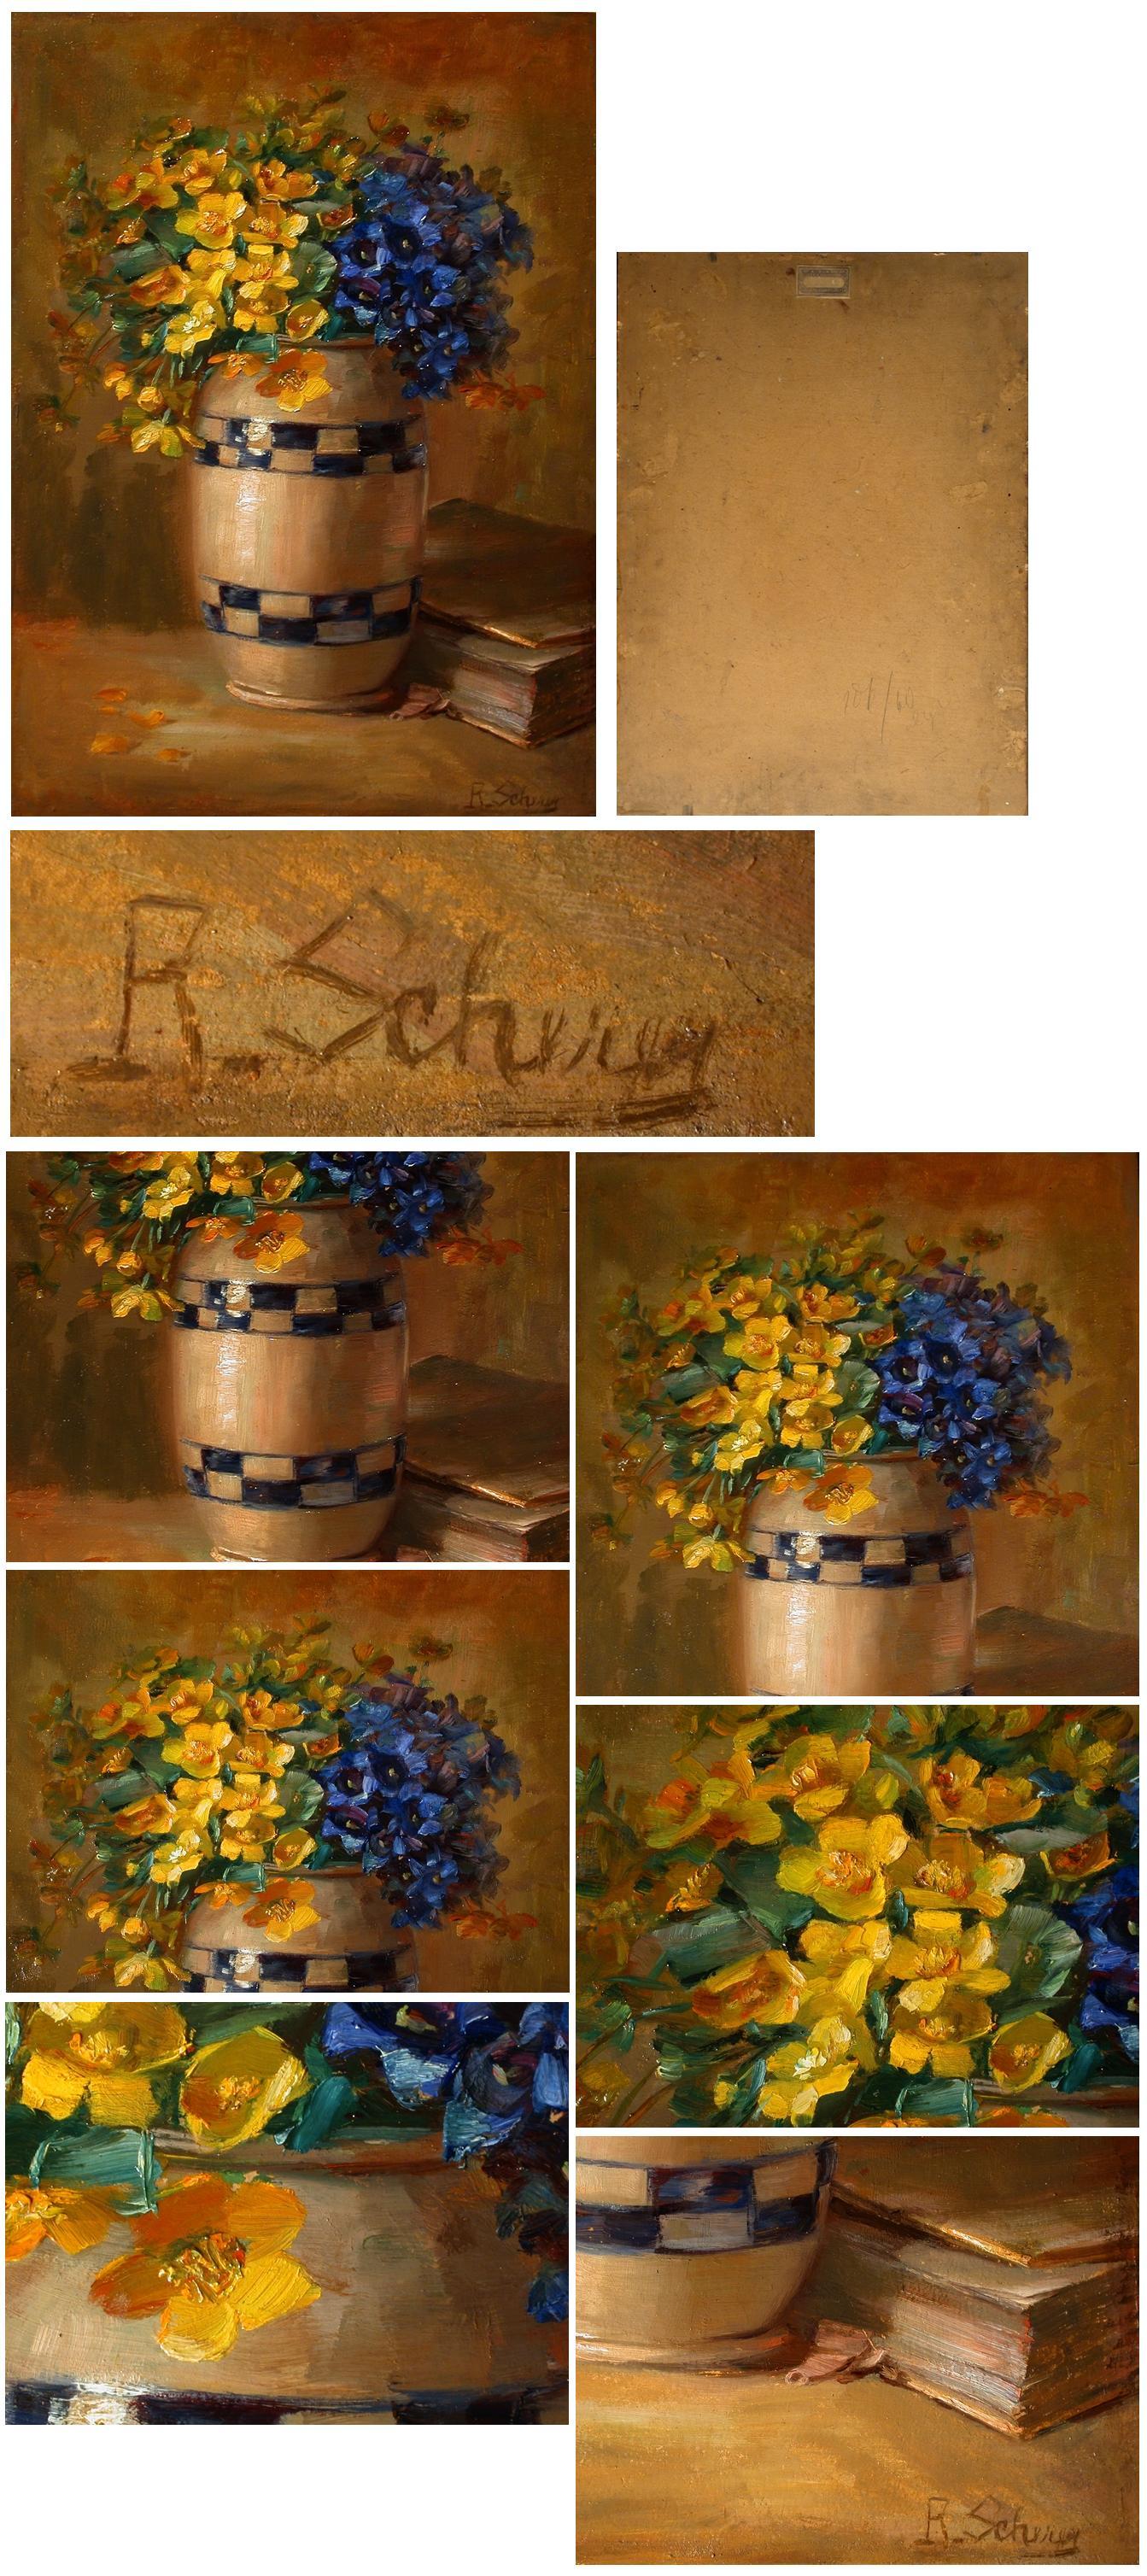 rosa scherer 1868 1926 sch lerin von olga wisinger florian ebay. Black Bedroom Furniture Sets. Home Design Ideas